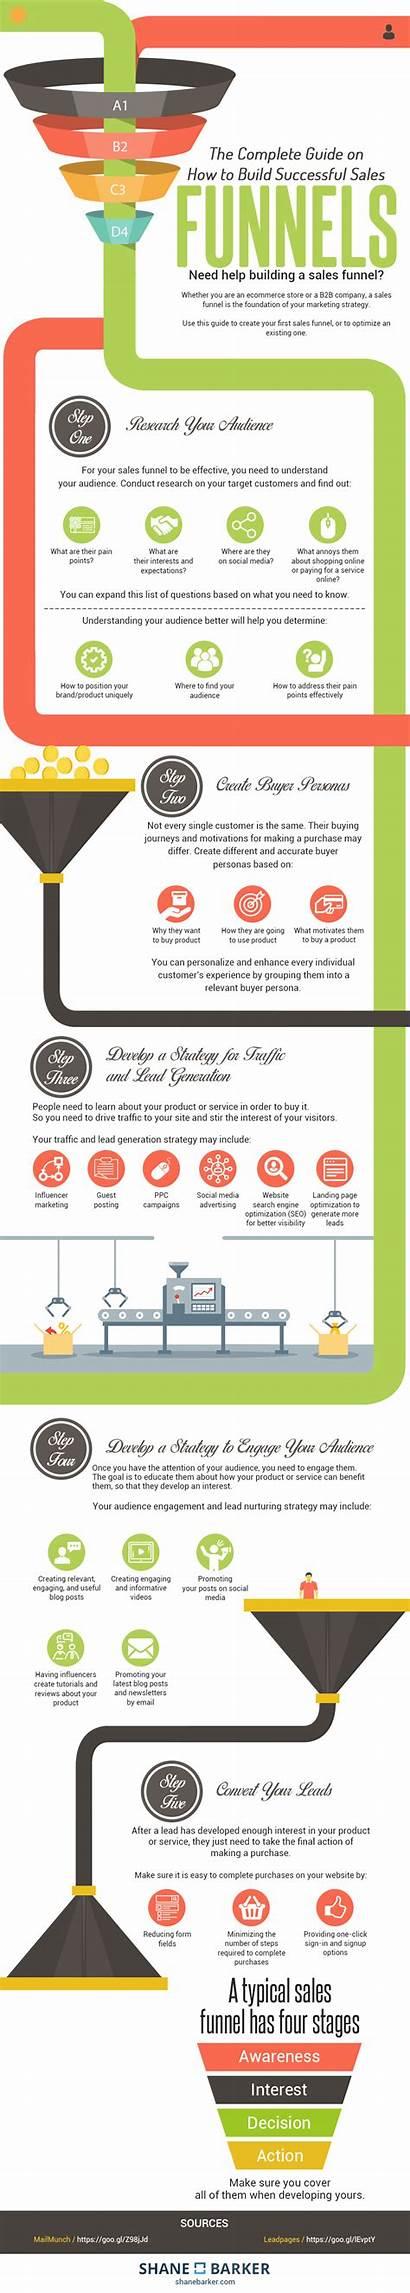 Funnel Sales Steps Infographic Funnels Build Guide